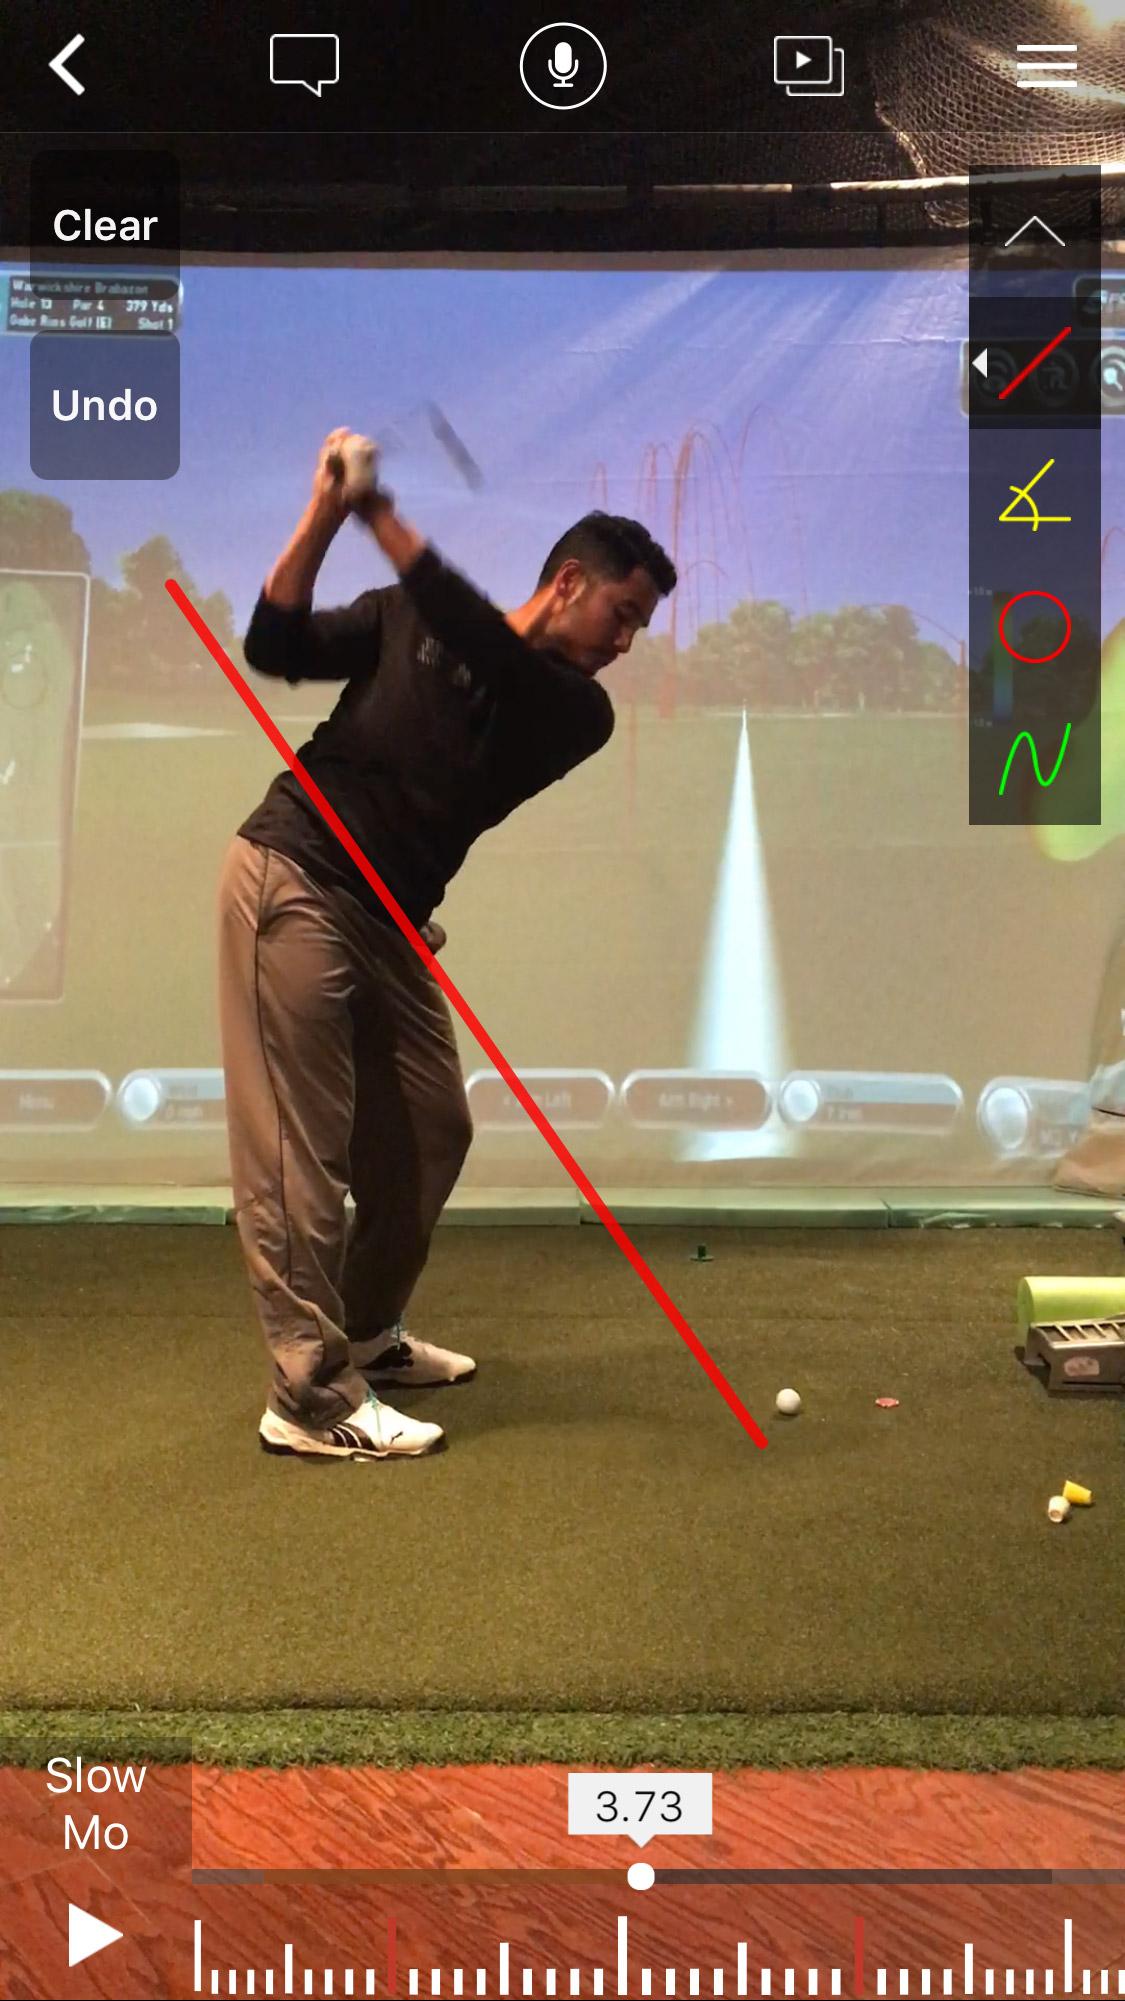 free golf lesson via assessment of gabe rios golf using advanced golf tech